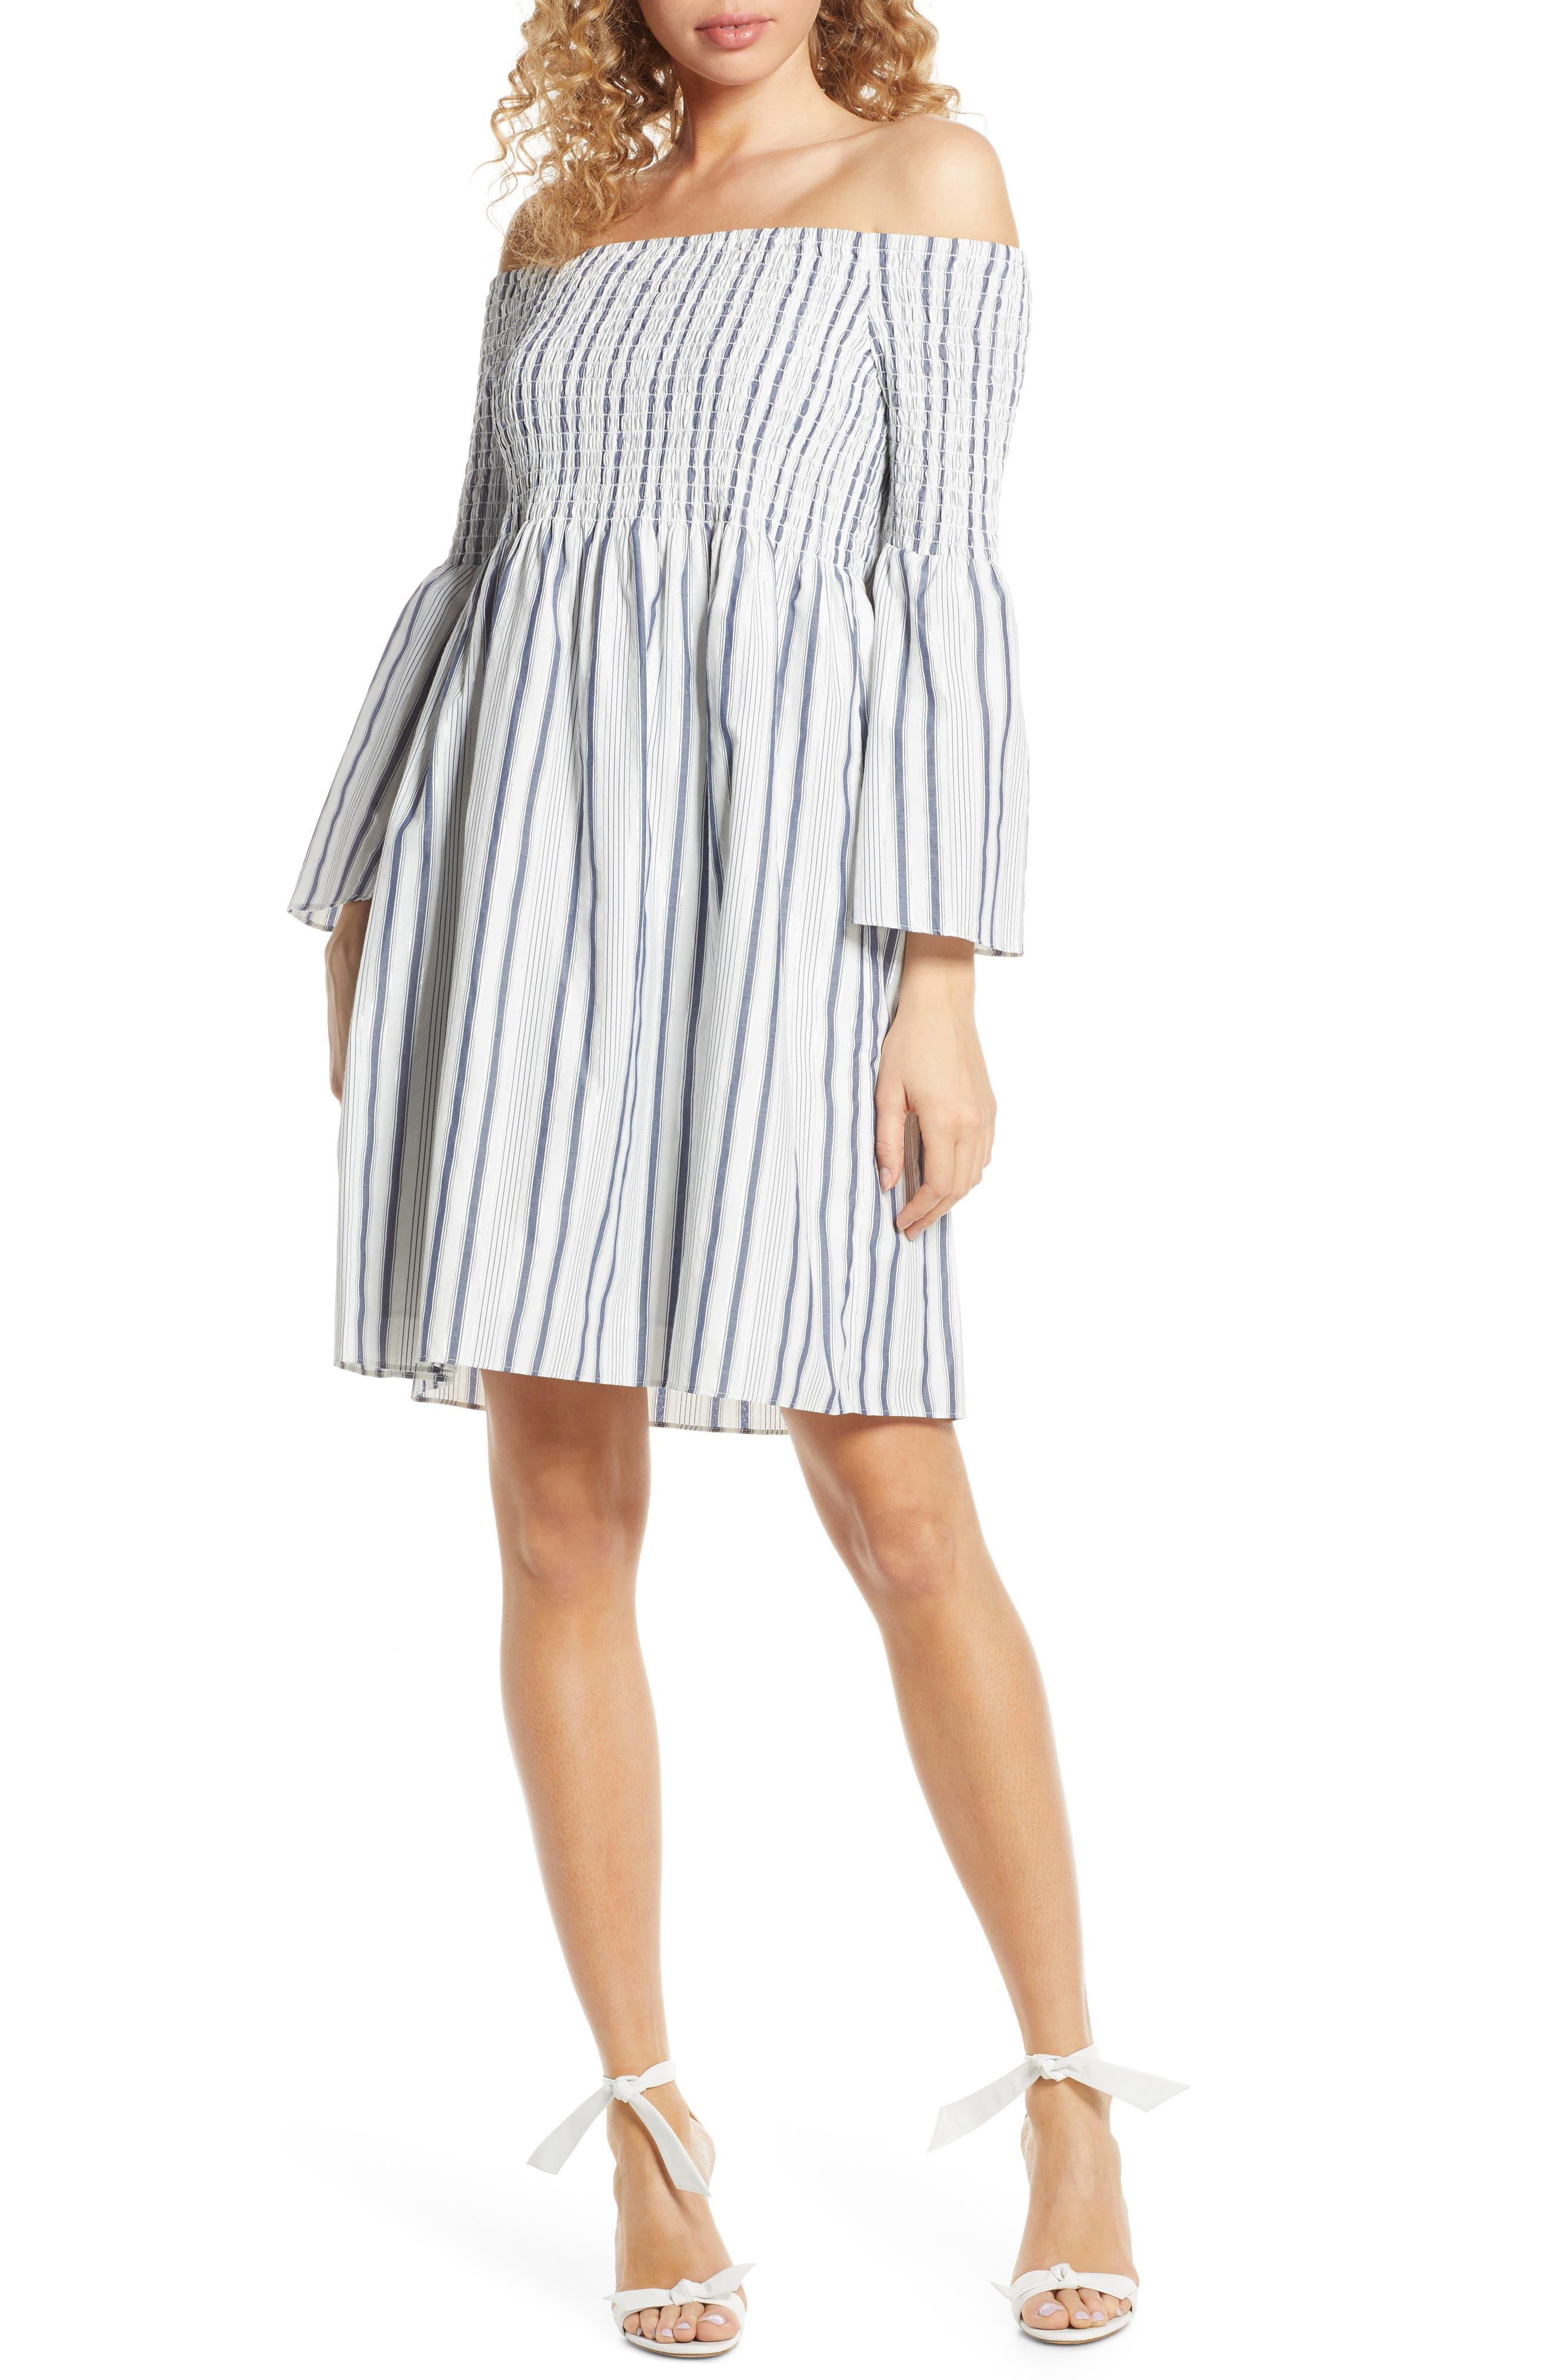 Sam Edelman Metallic Ticking Stripe Smocked Off The Shoulder Dress, Blue